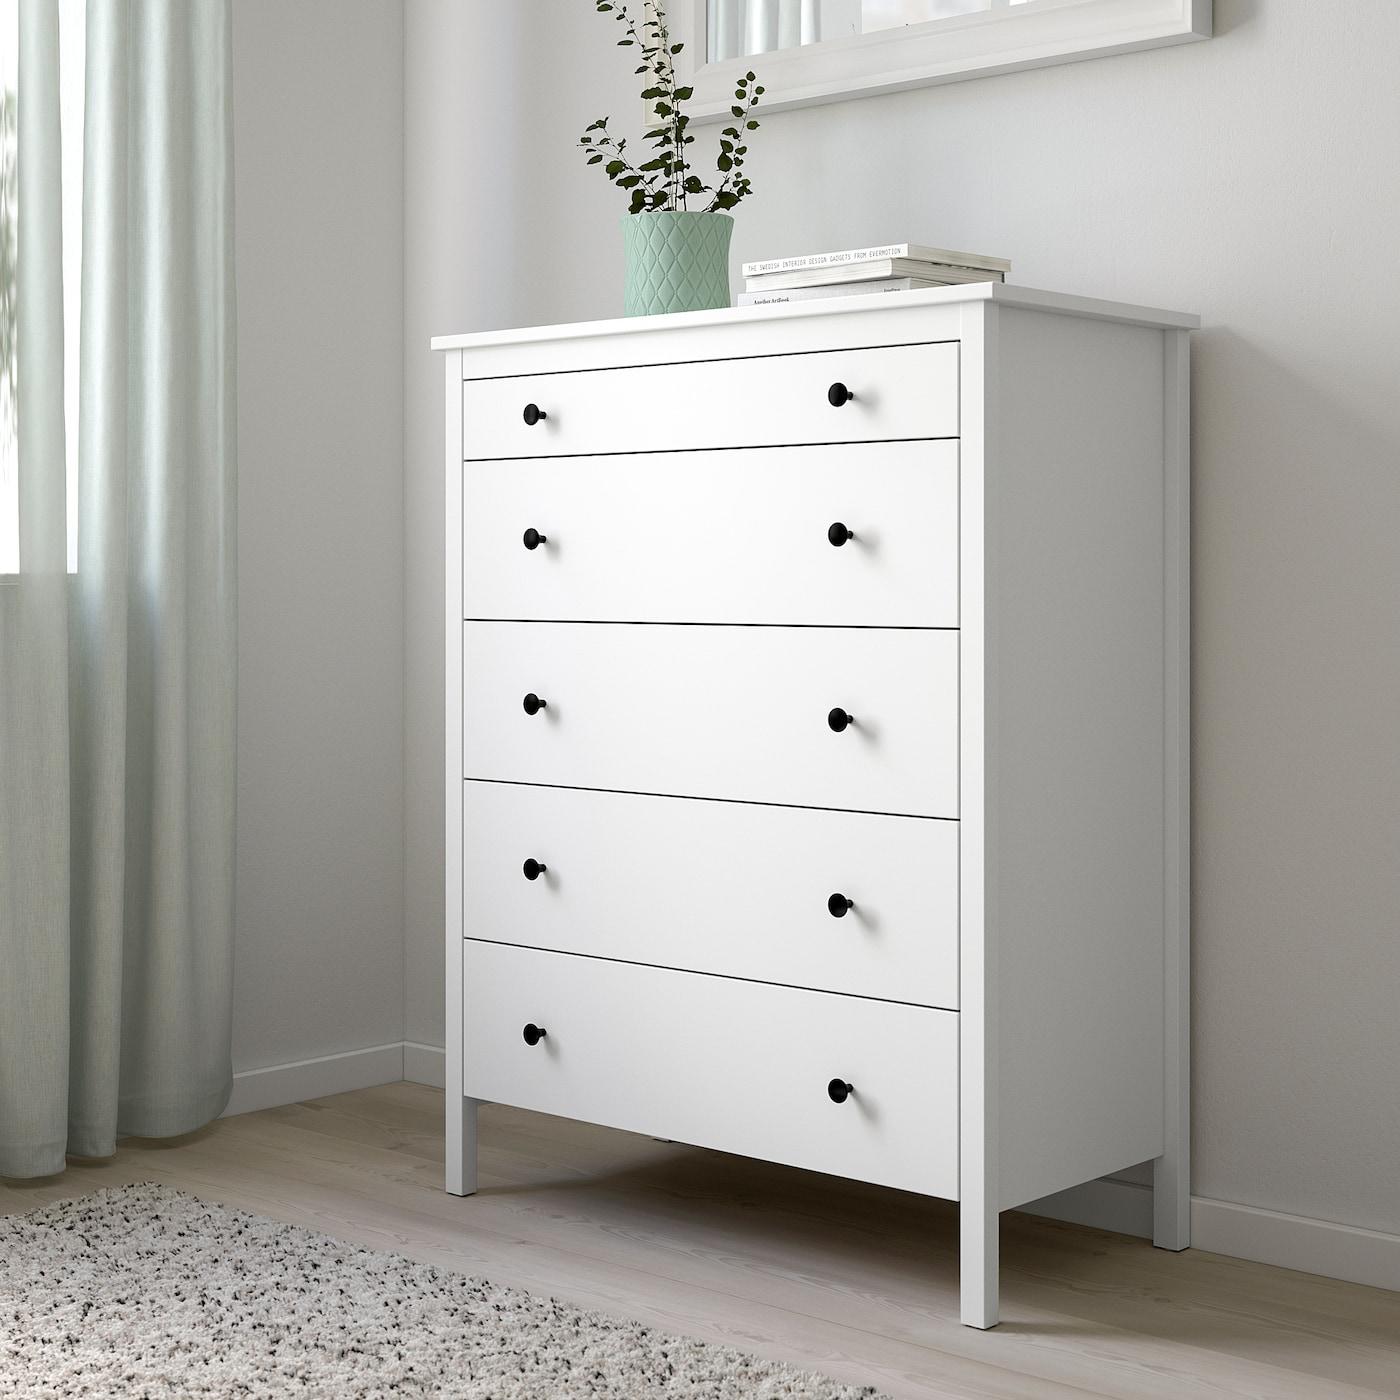 KOPPANG Chest of 5 drawers, white, 90x114 cm